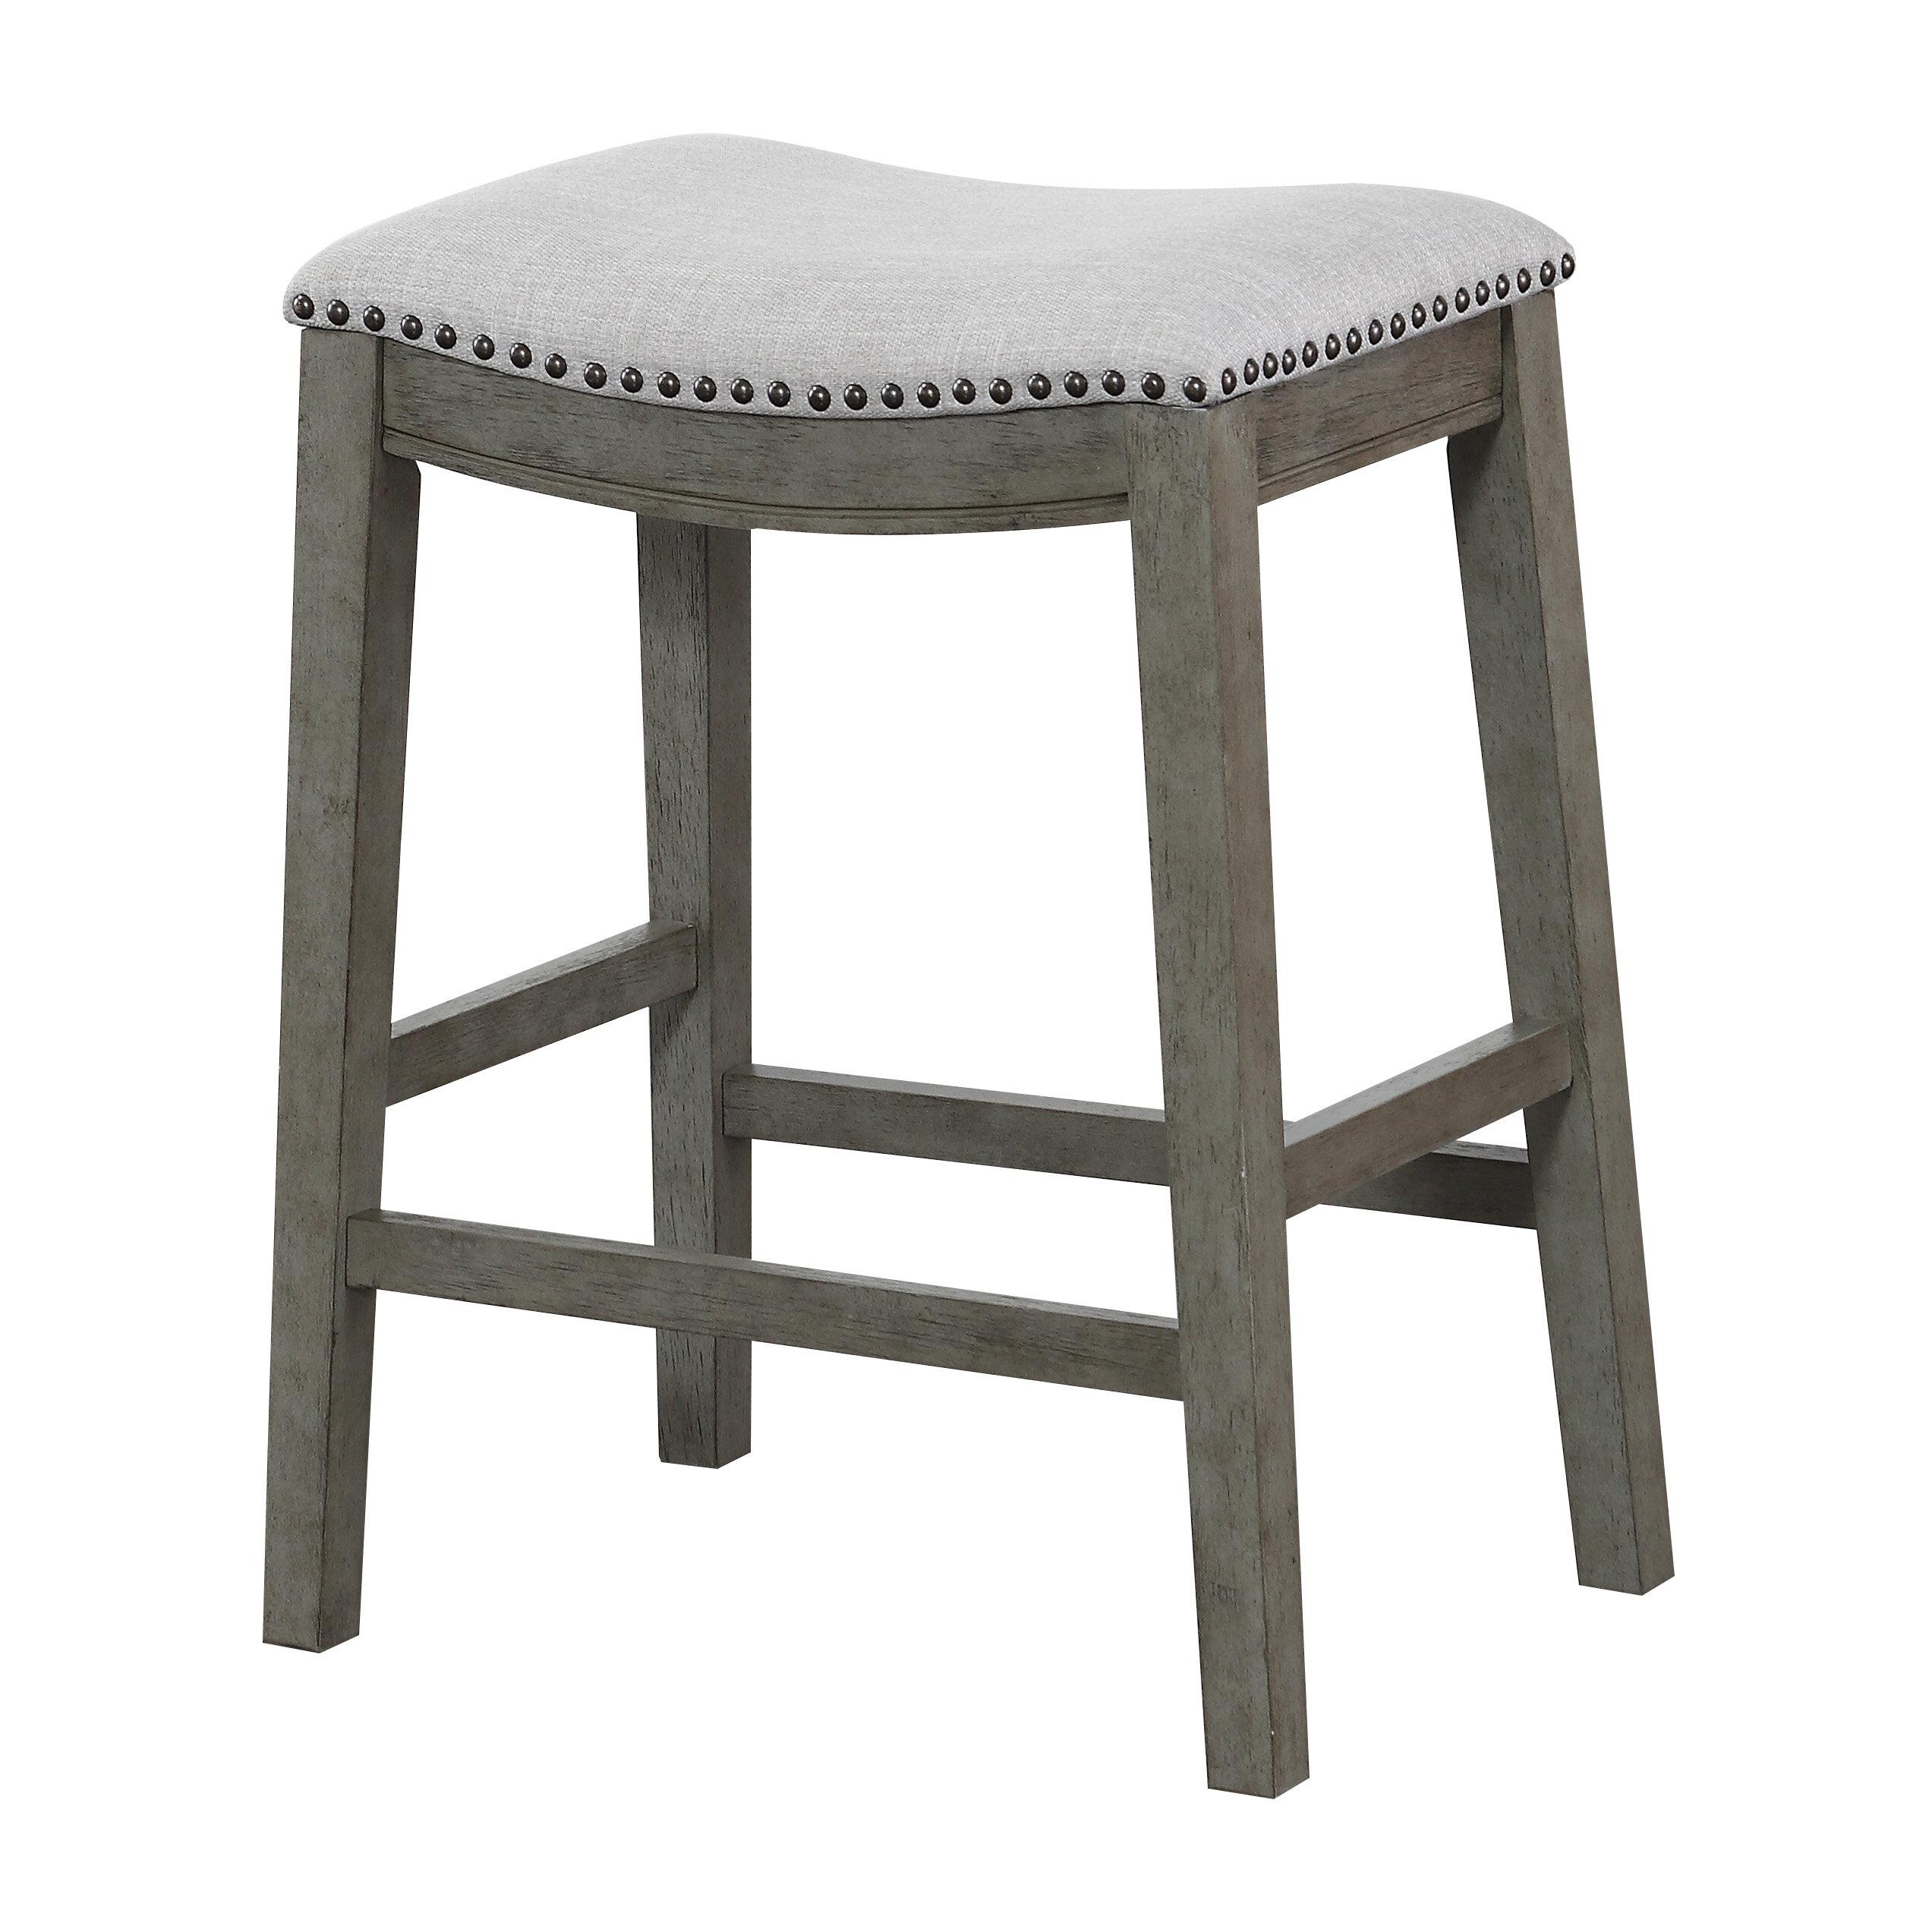 Amazing Clewiston 24 75 Bar Stool Cjindustries Chair Design For Home Cjindustriesco